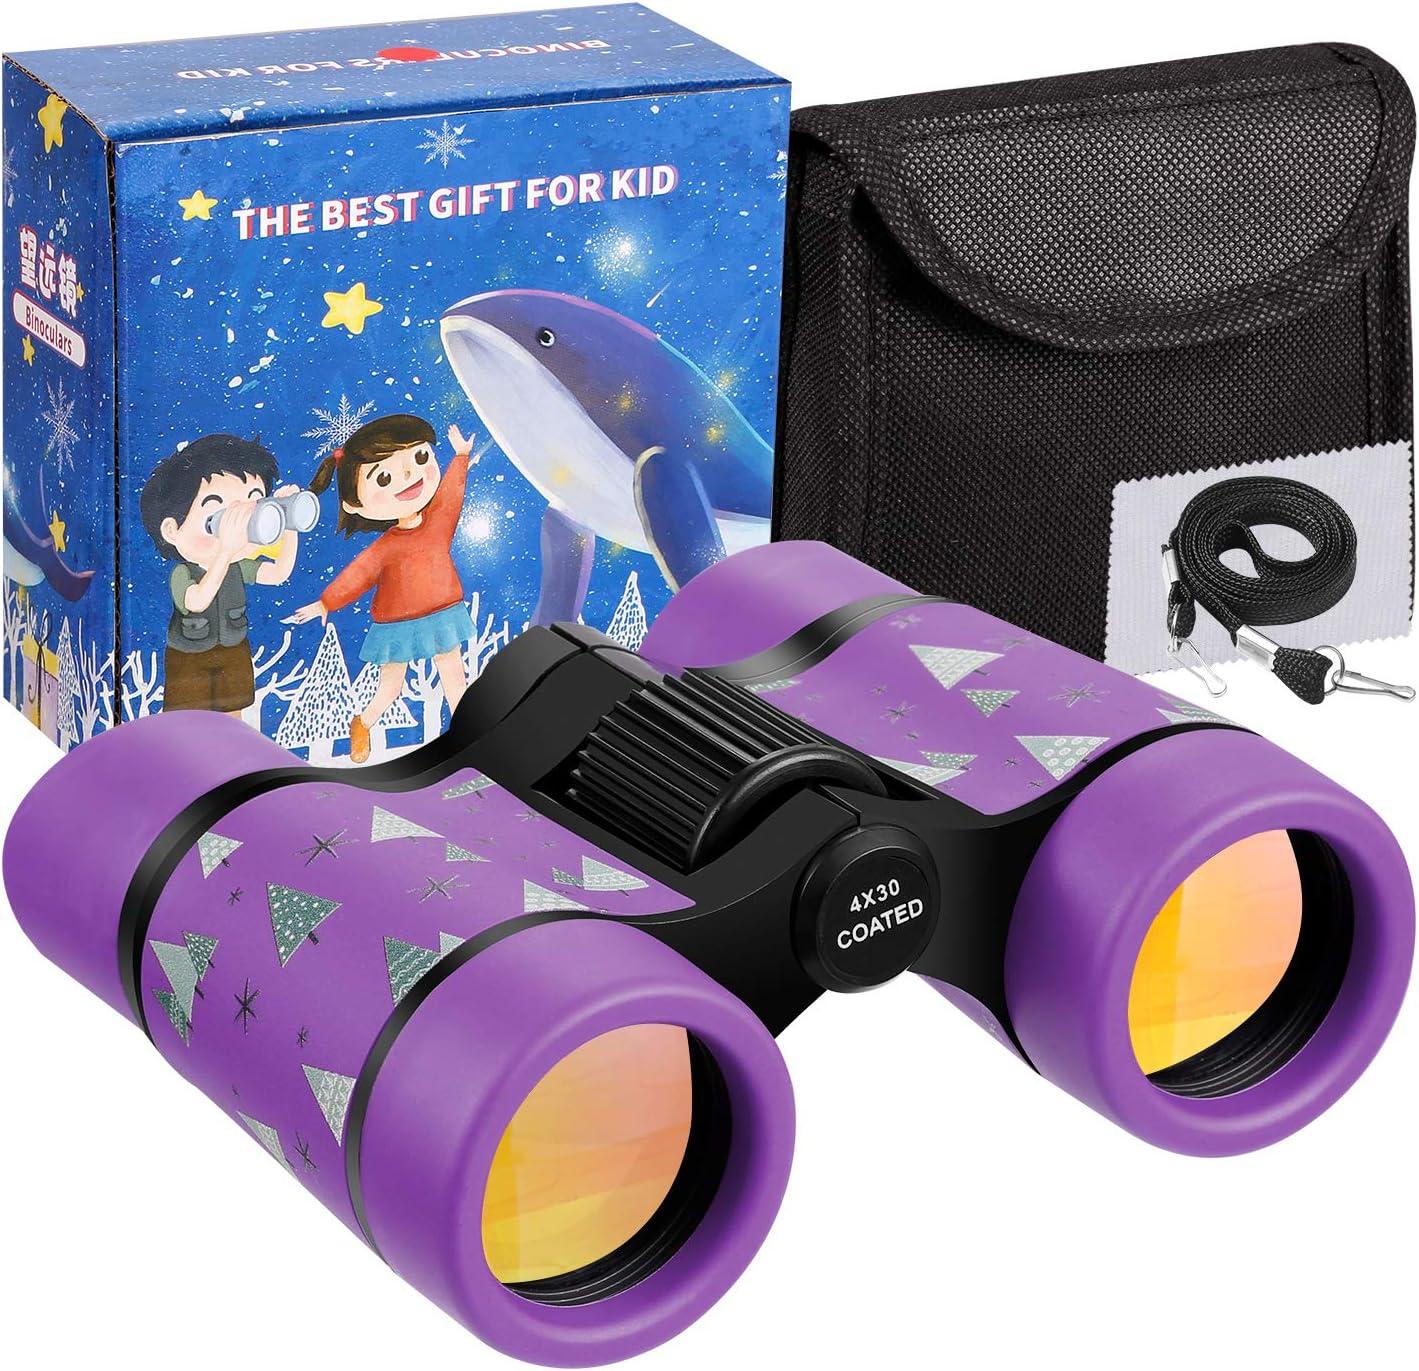 Details about  /Kid Binoculars 8x30 Binoculars for Kids Bird Watching Educational Learning BLUE